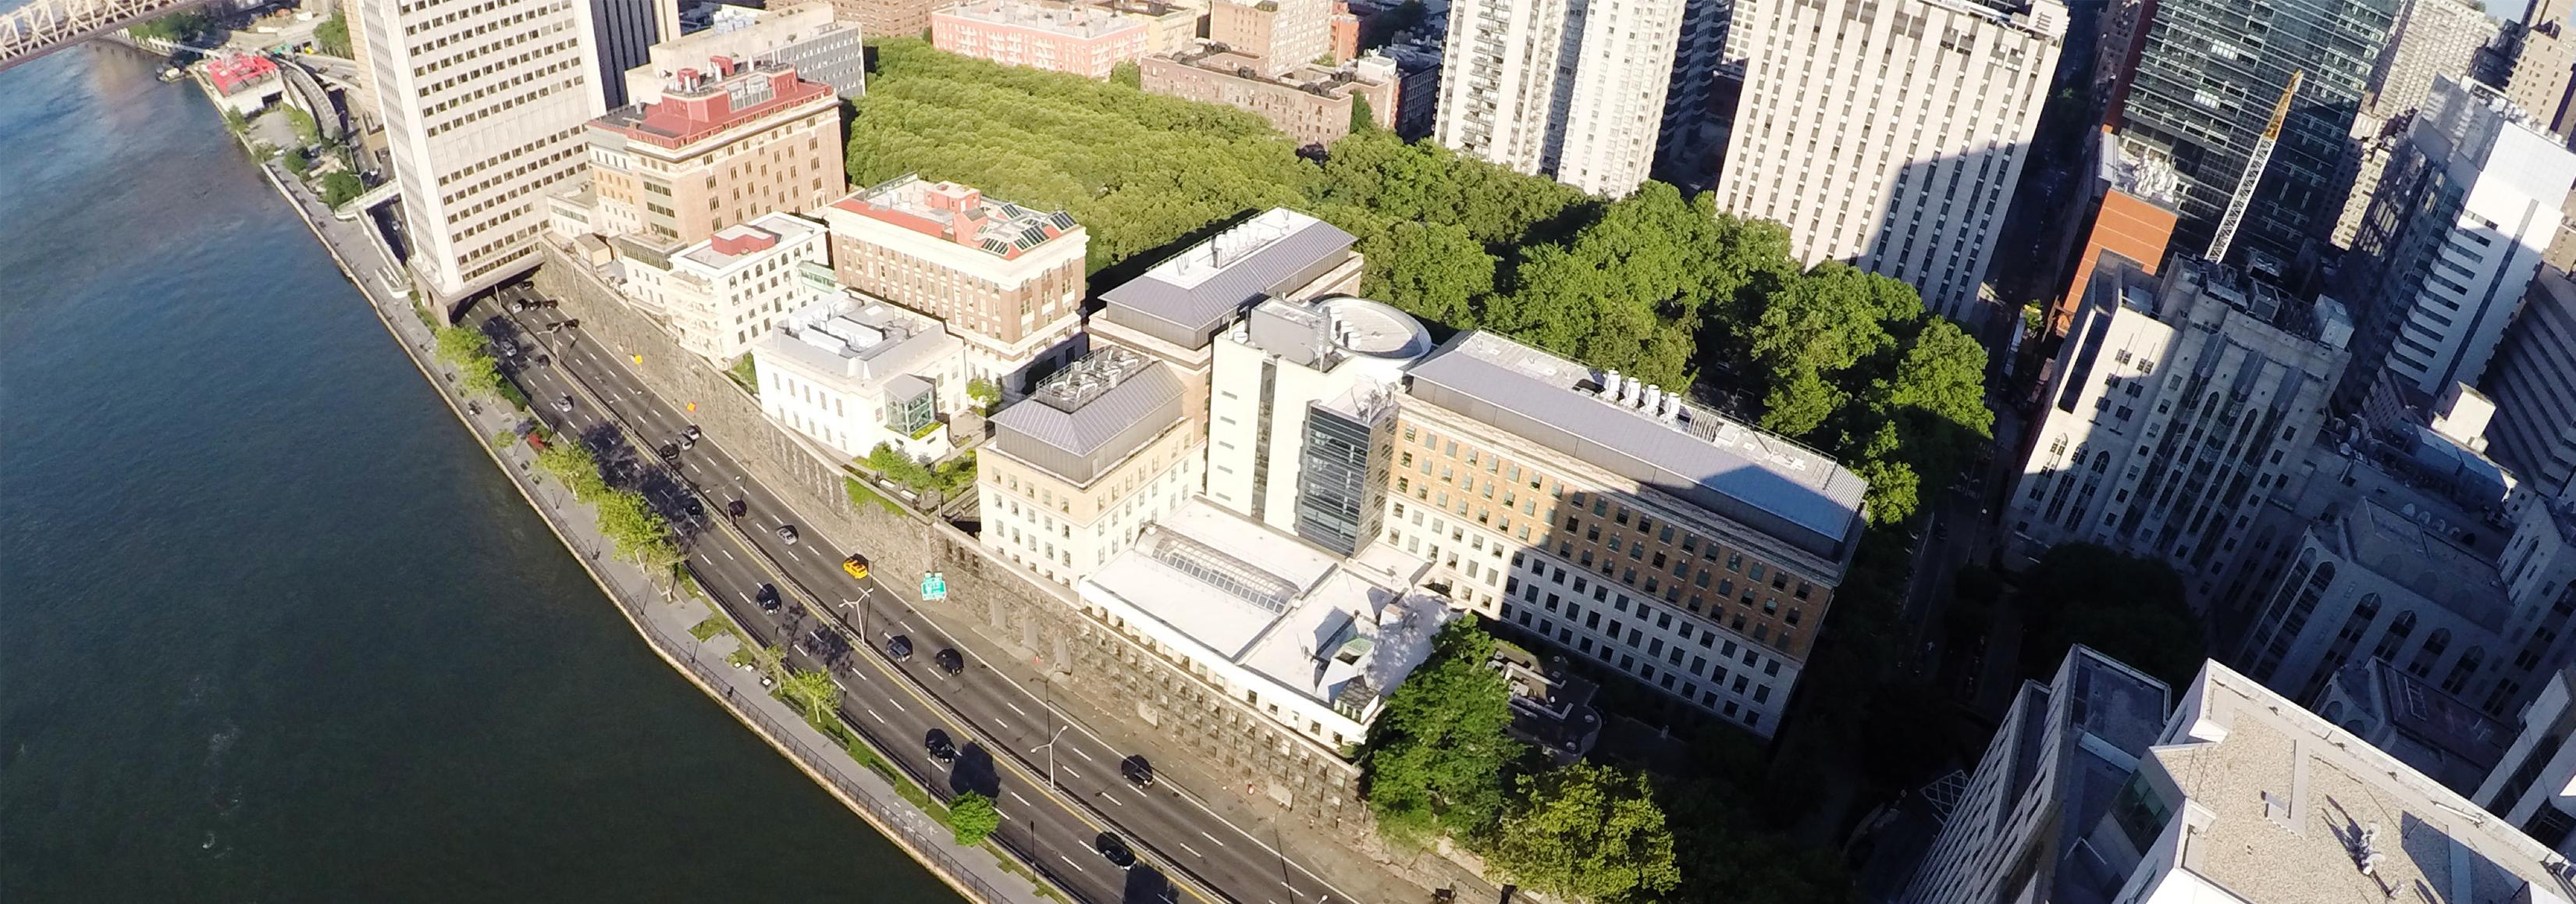 Rockefeller University Campus